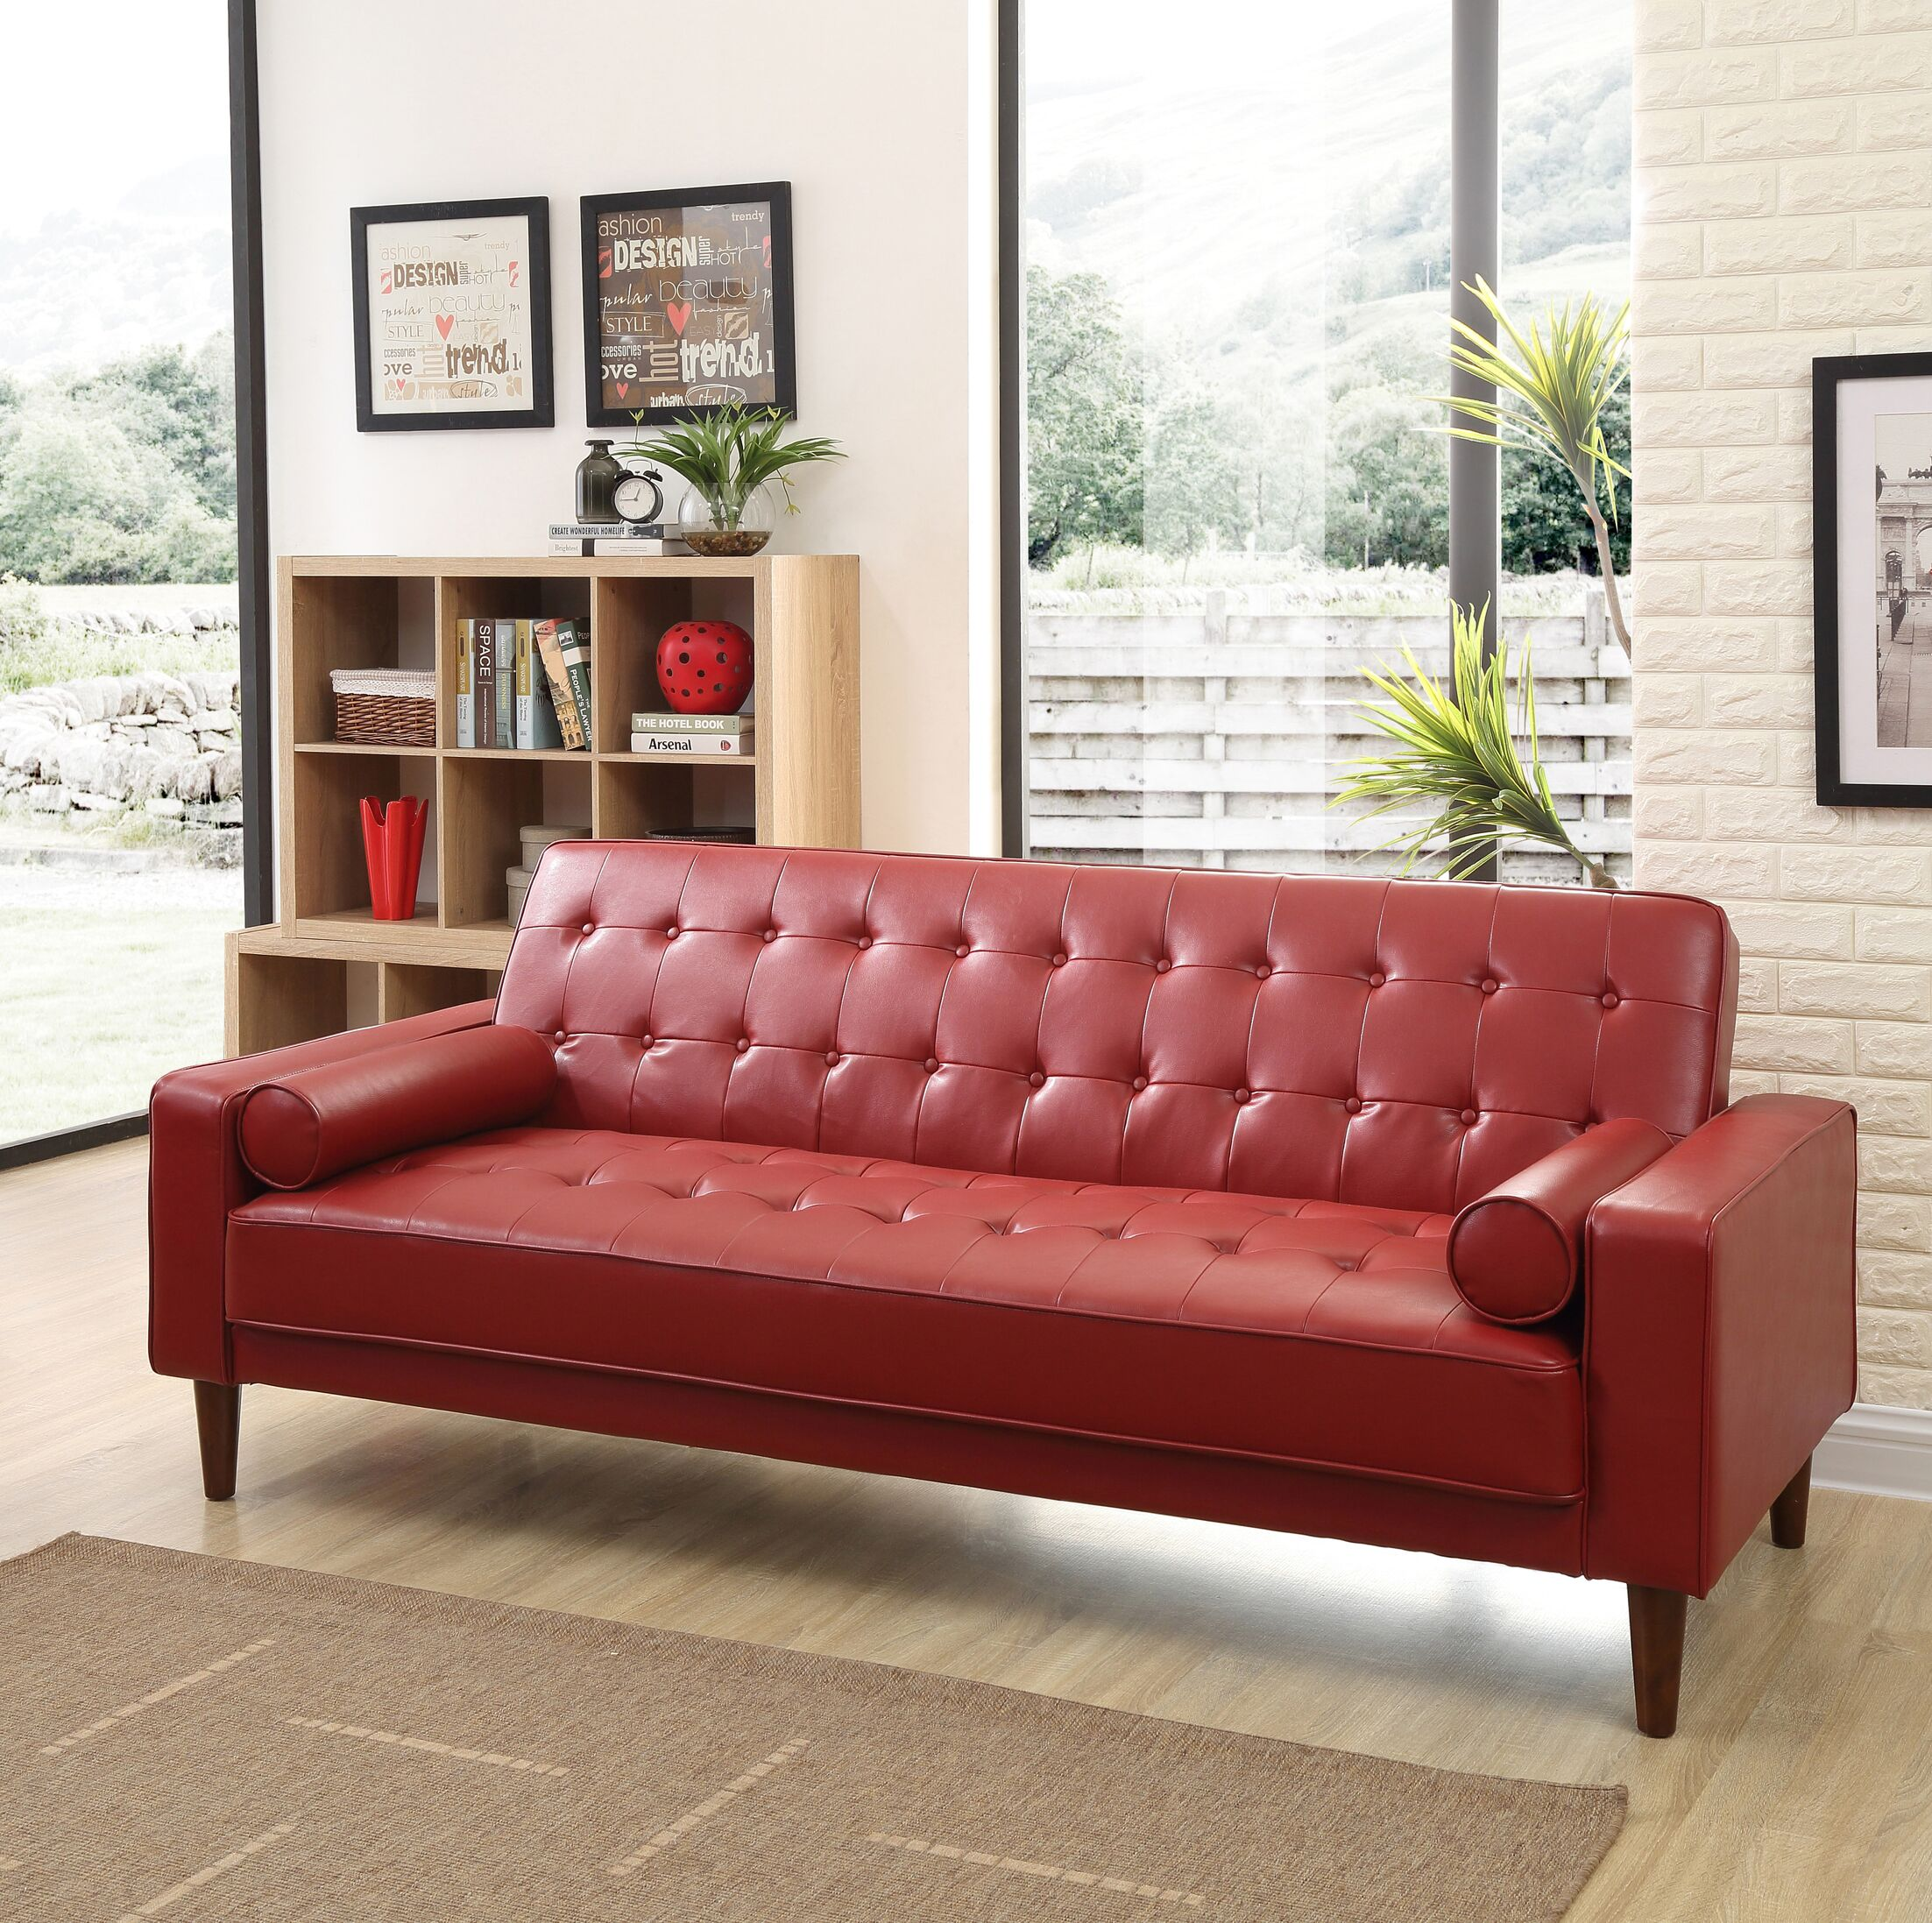 Shayne Convertible Sofa Upholstery: Red